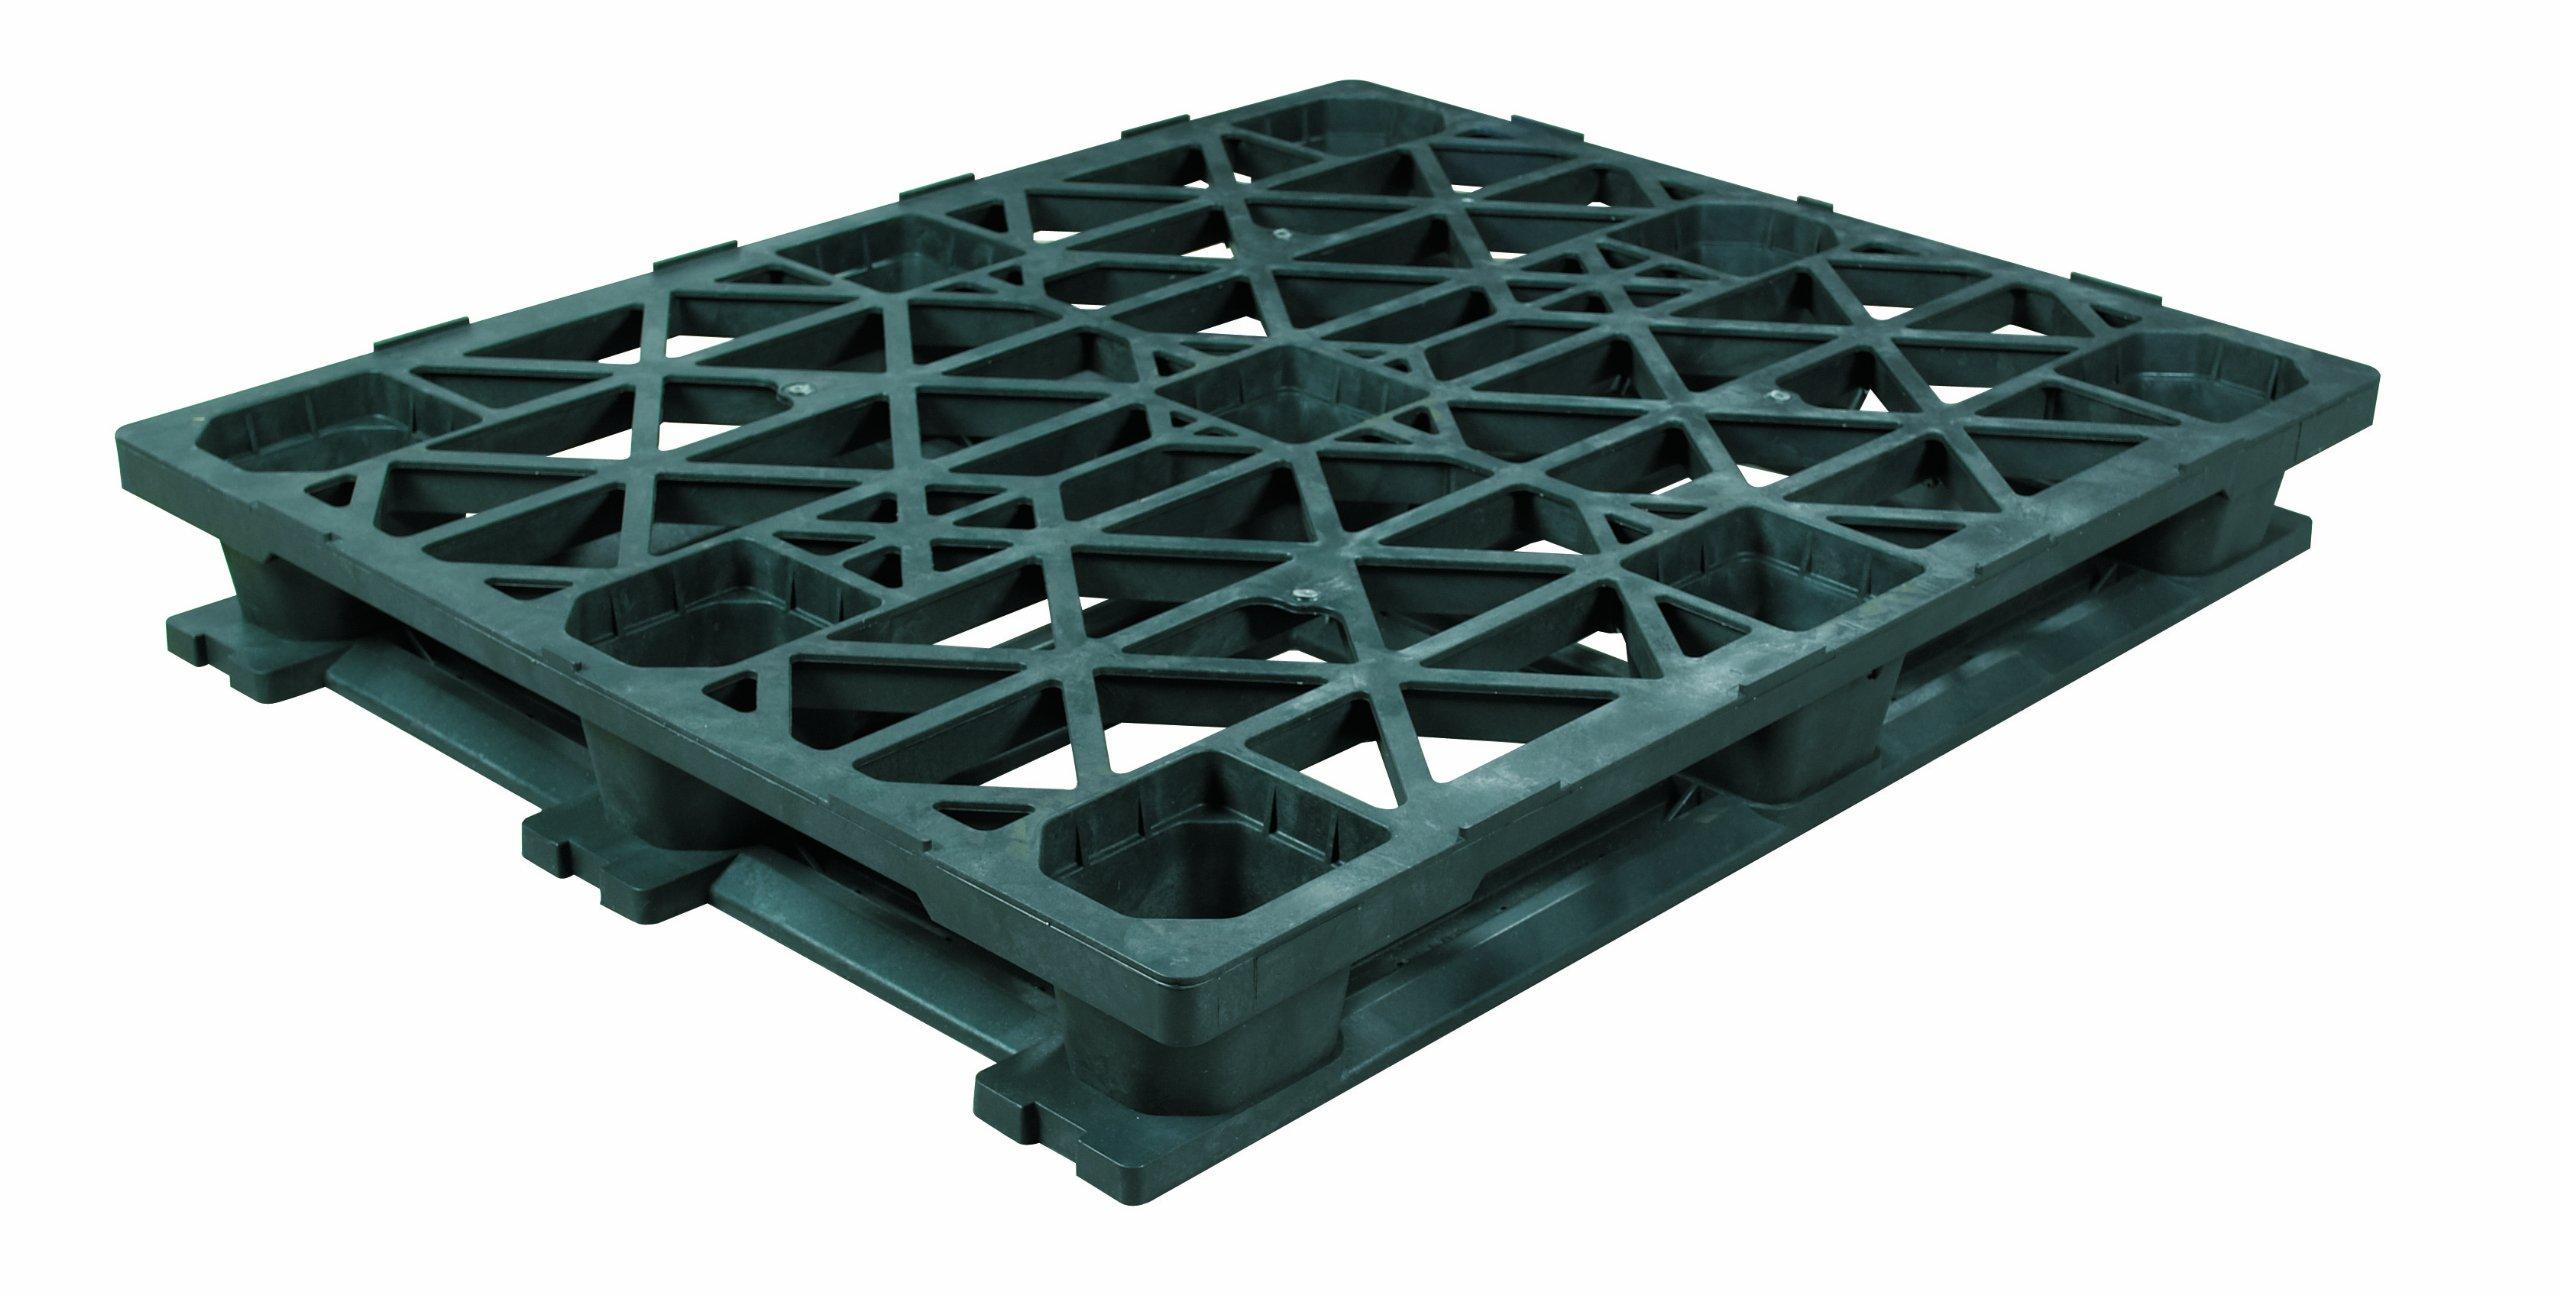 Aviditi CPP336 Heavy-Duty Plastic Pallet, 48'' x 40'' x 5 9/10'', Black